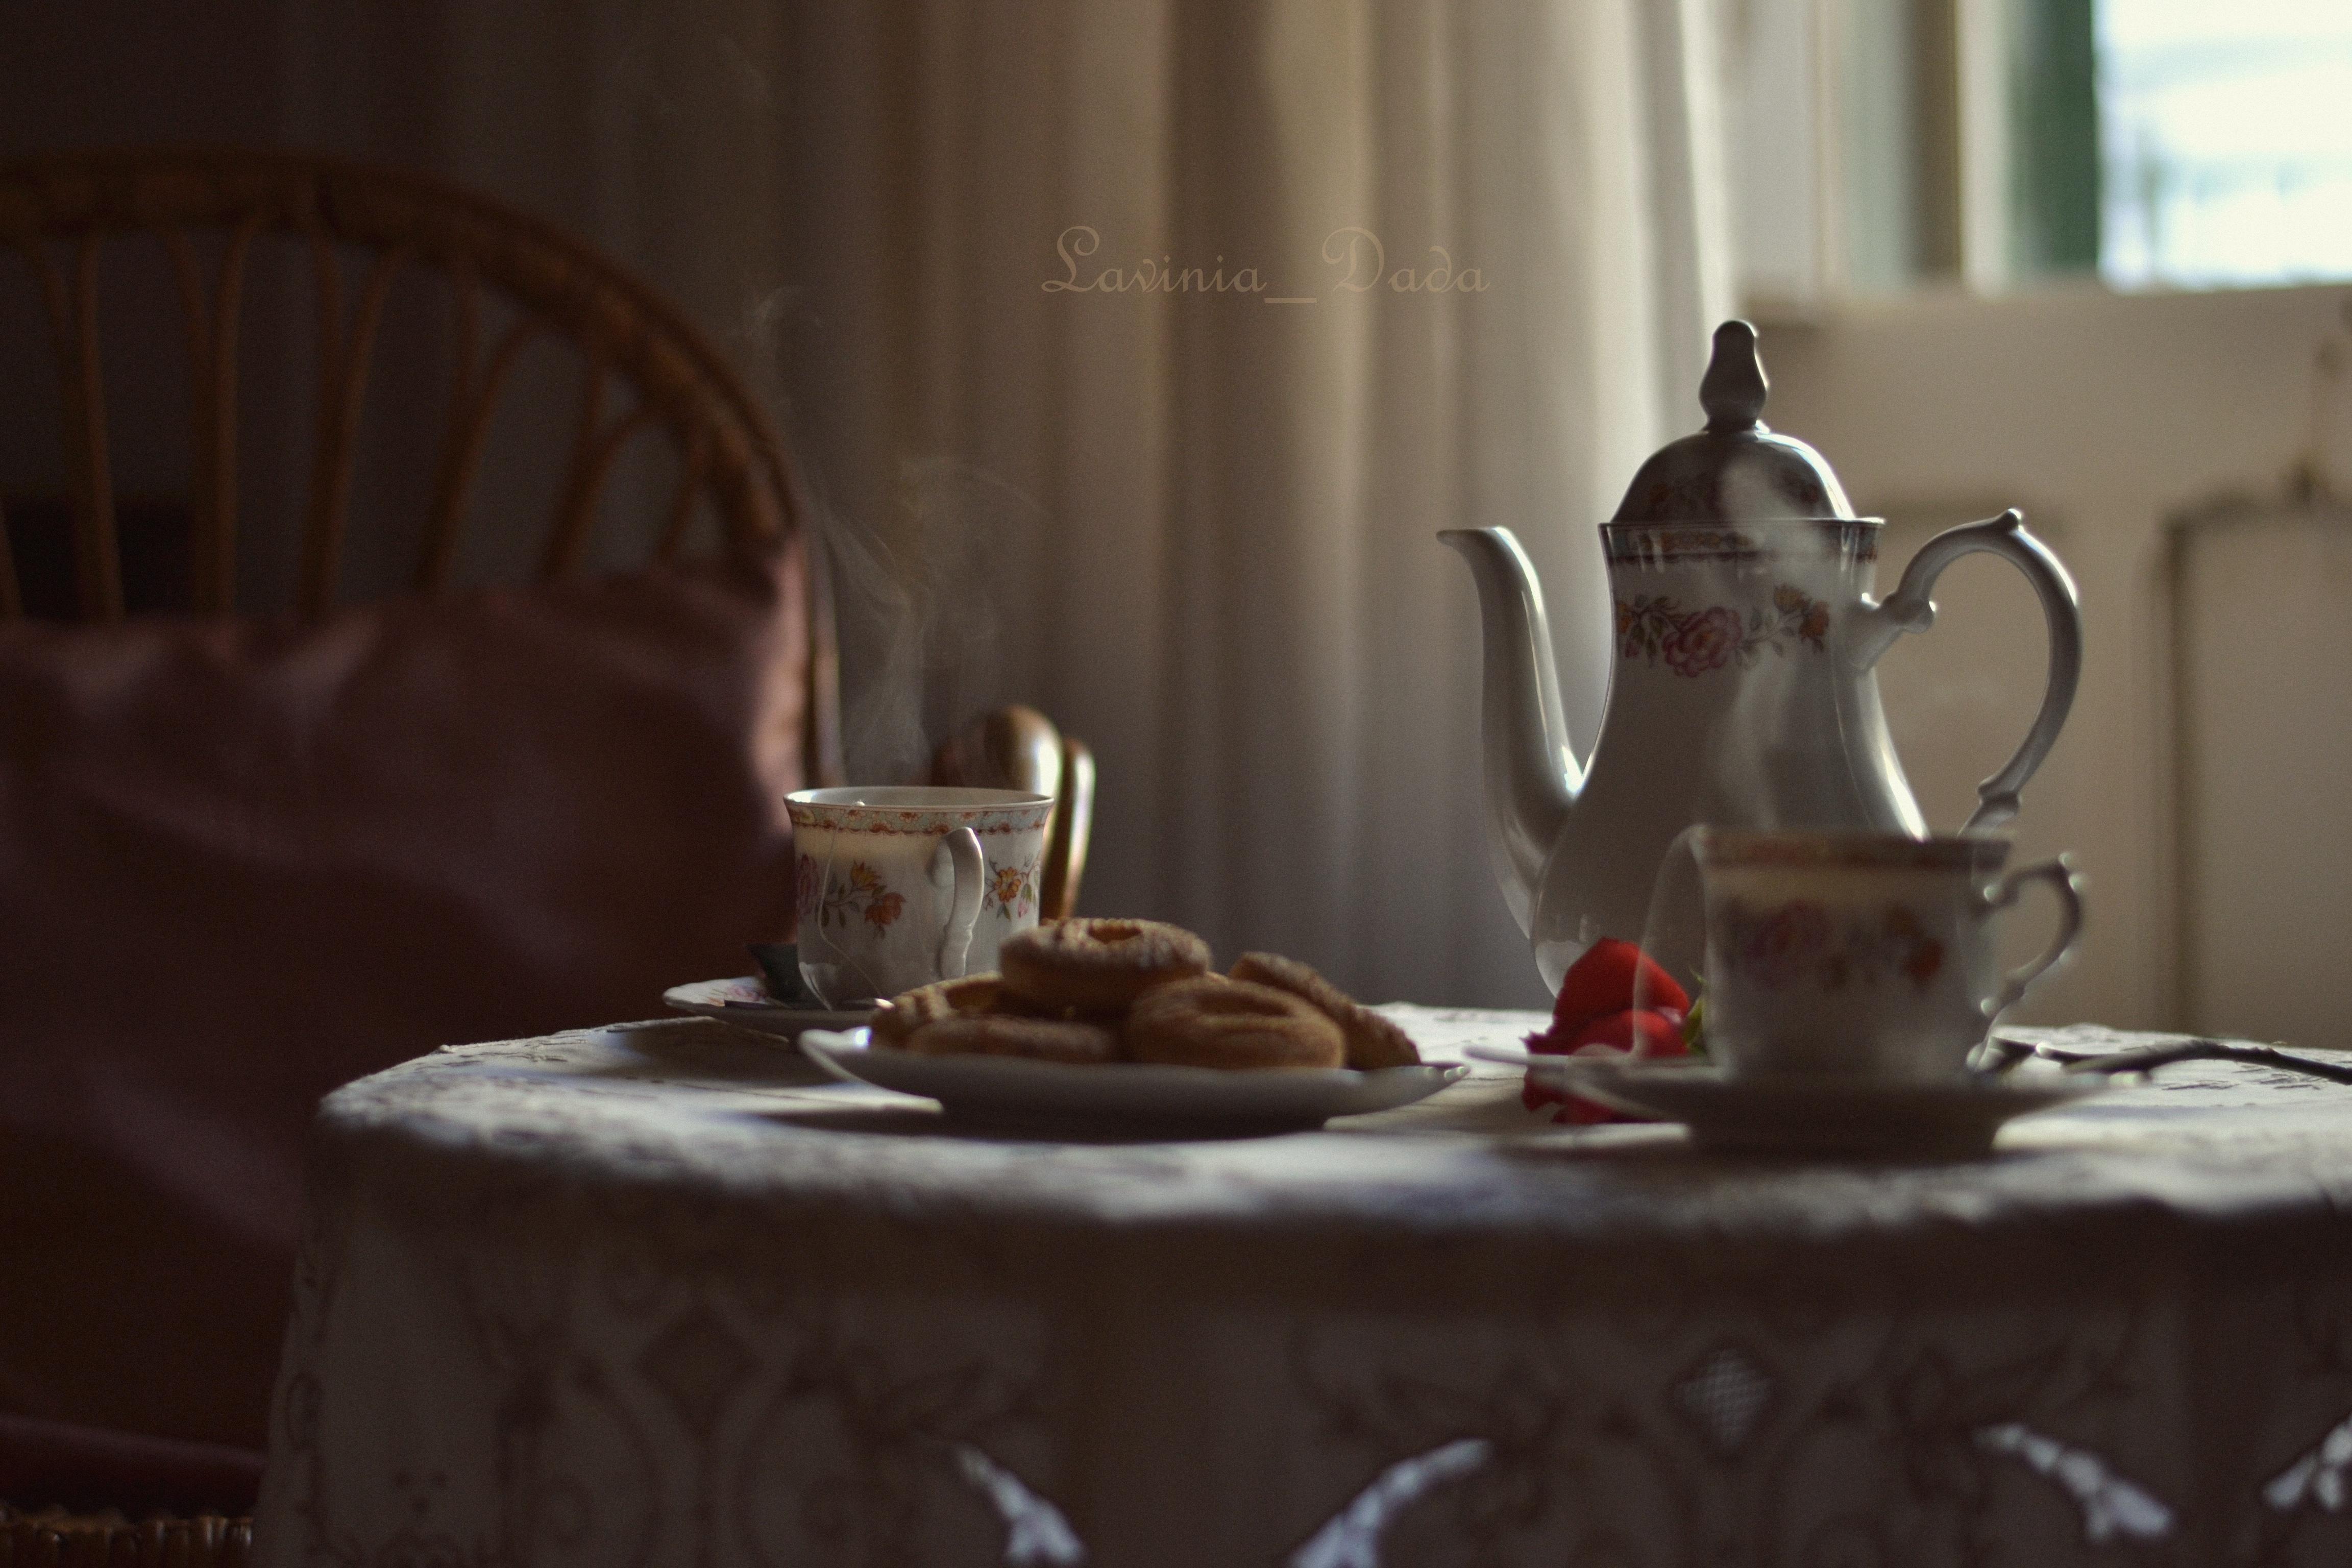 Wallpaper : food, love, table, tea, vintage, pastel, interior design ...